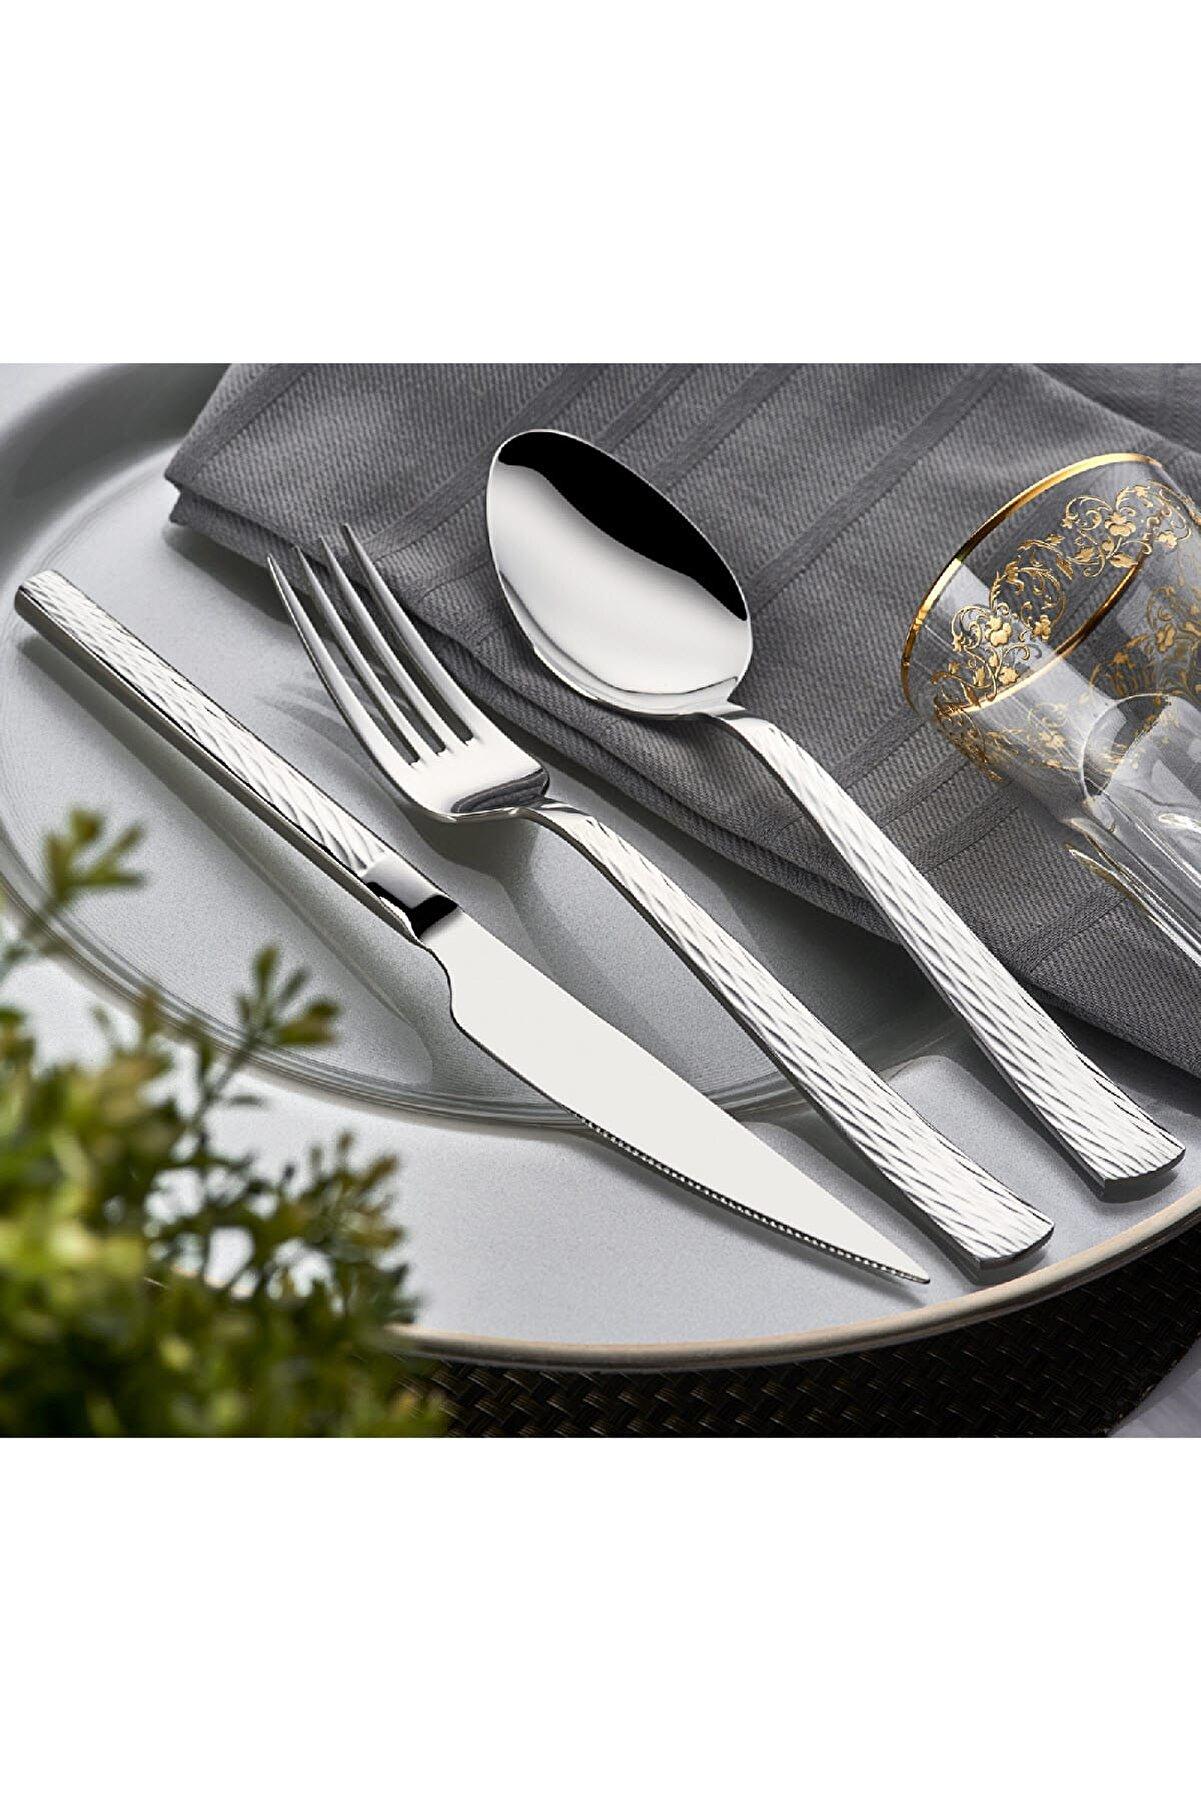 Hira Yemek bıçağı hira lara 12 adet